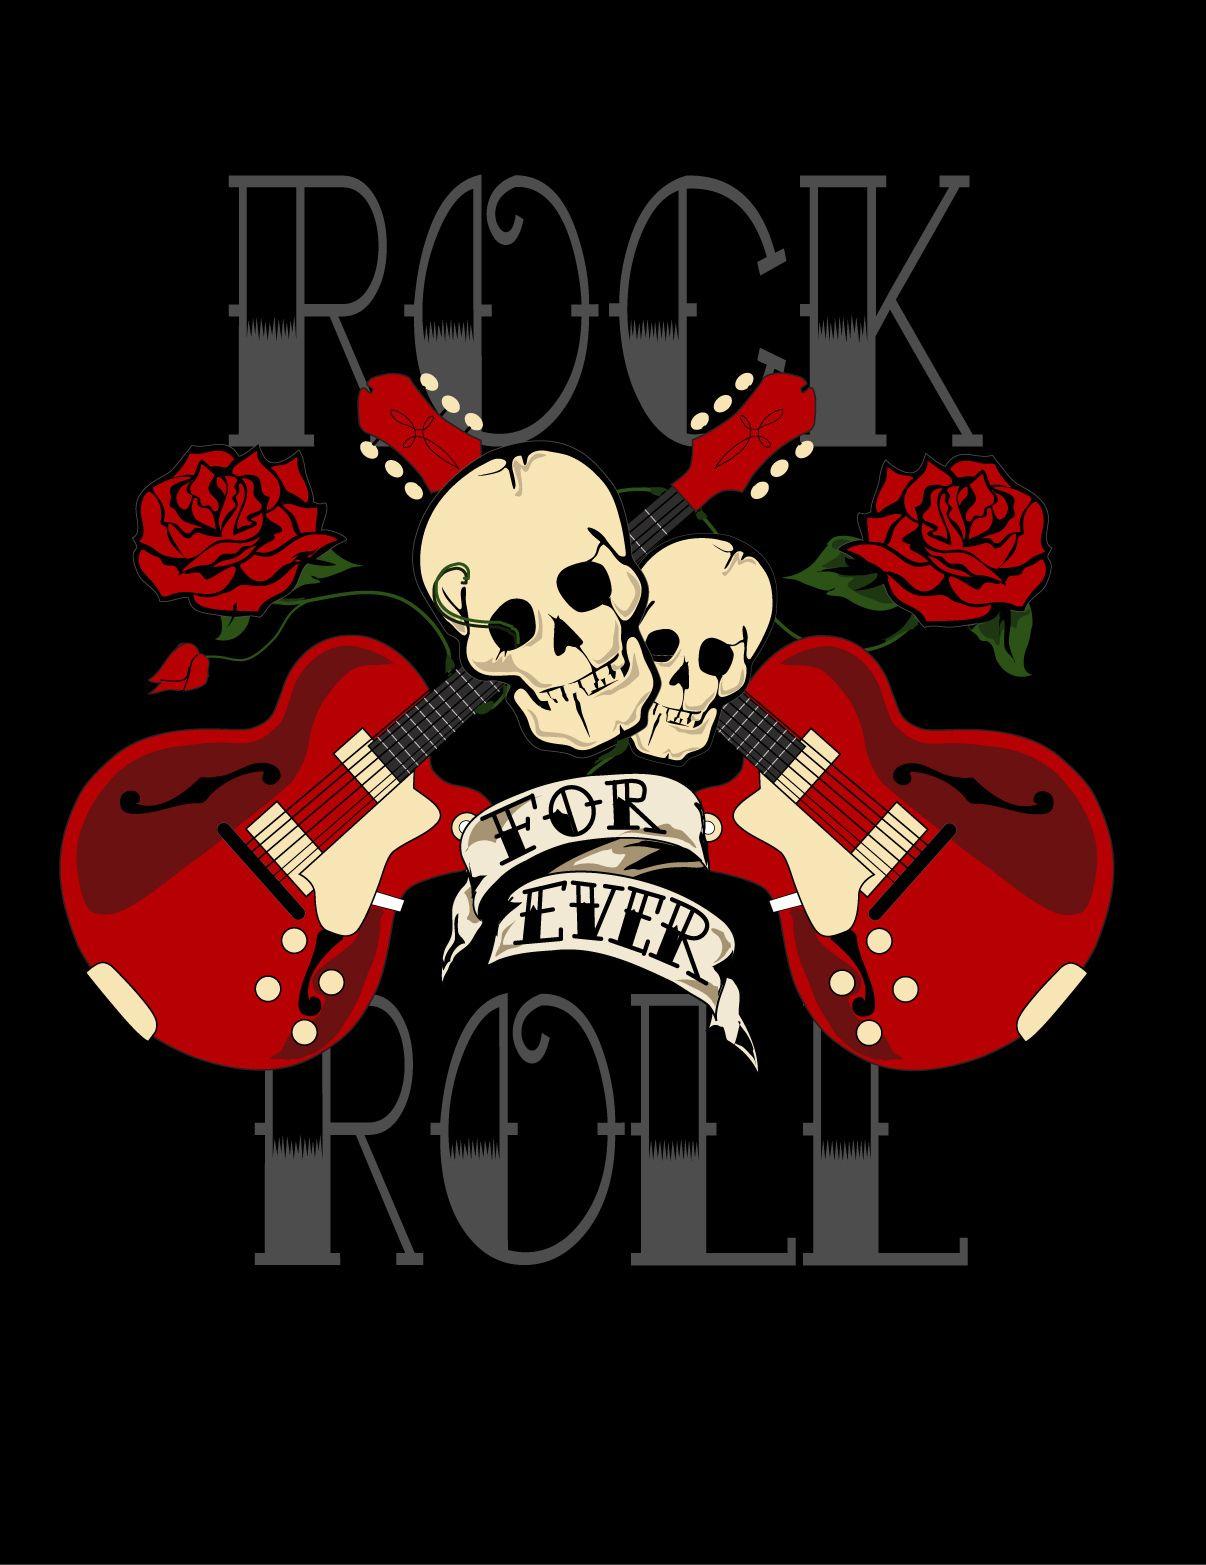 Rock N 39 Roll Club Images Rock N 39 Roll Forever Hd Wallpaper And Rock And Roll Rock N Roll Rock